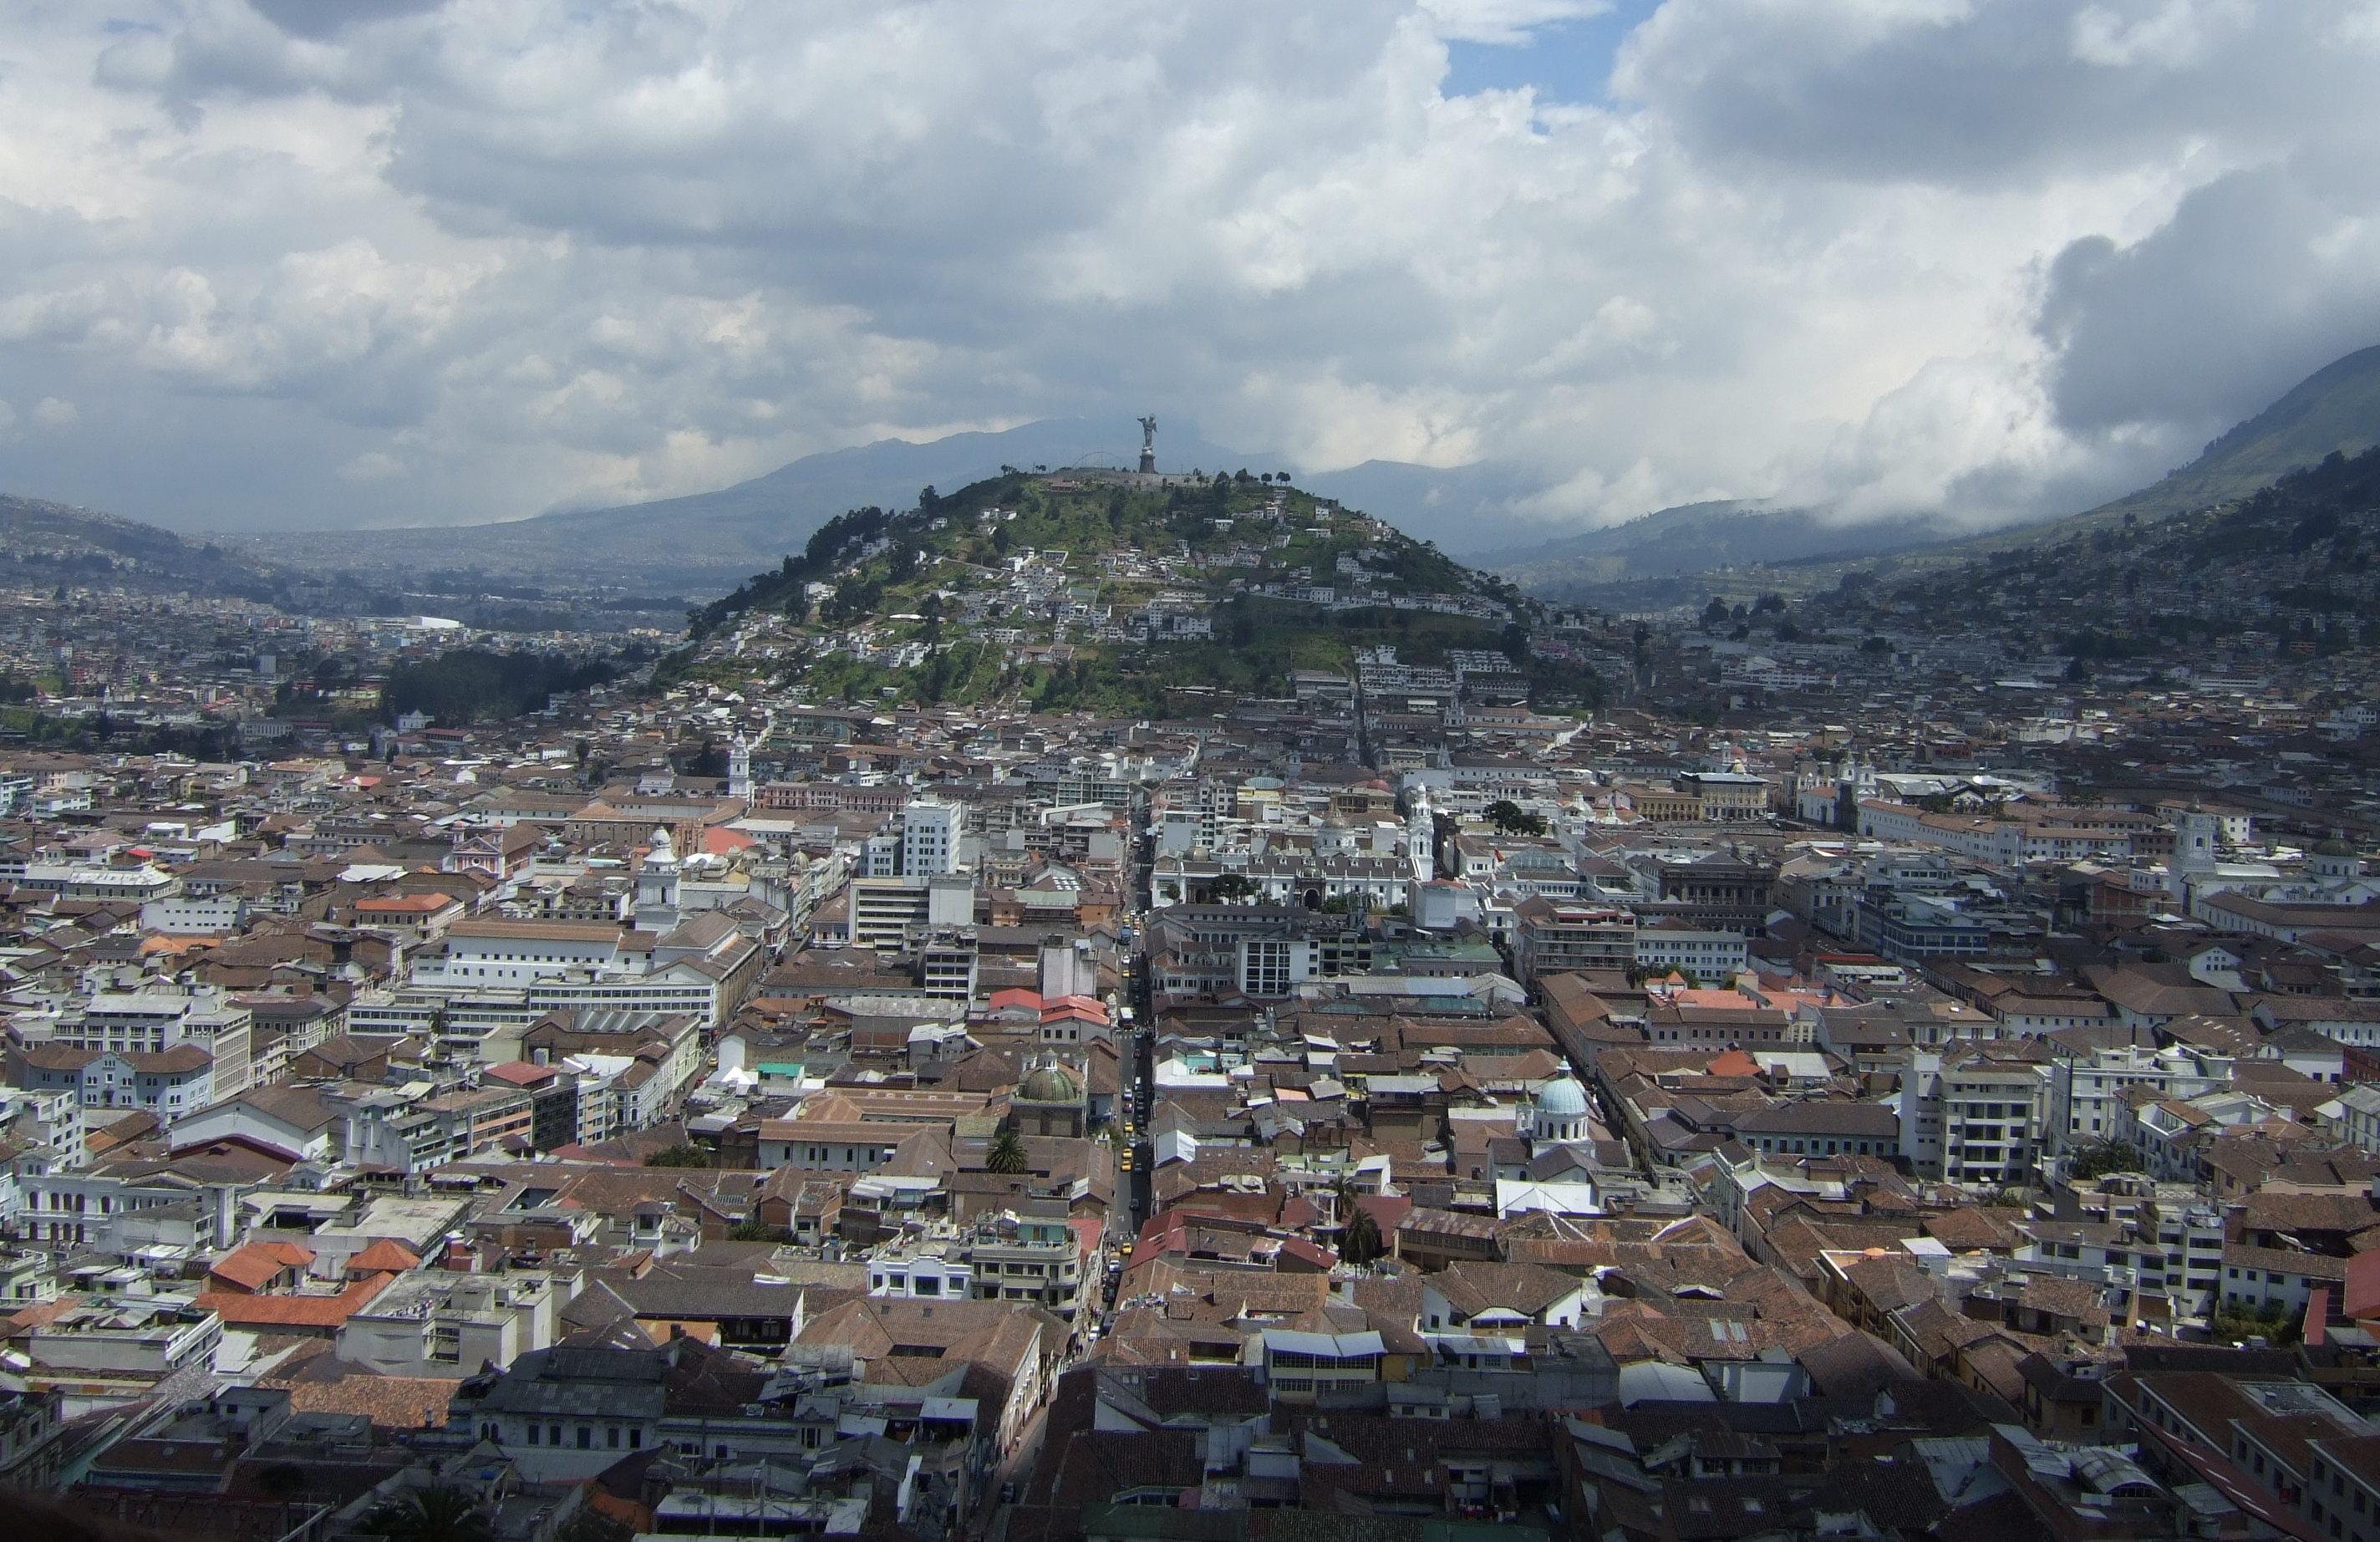 Quito Ecuador  City pictures : Virgen de Quito Wikimedia Commons